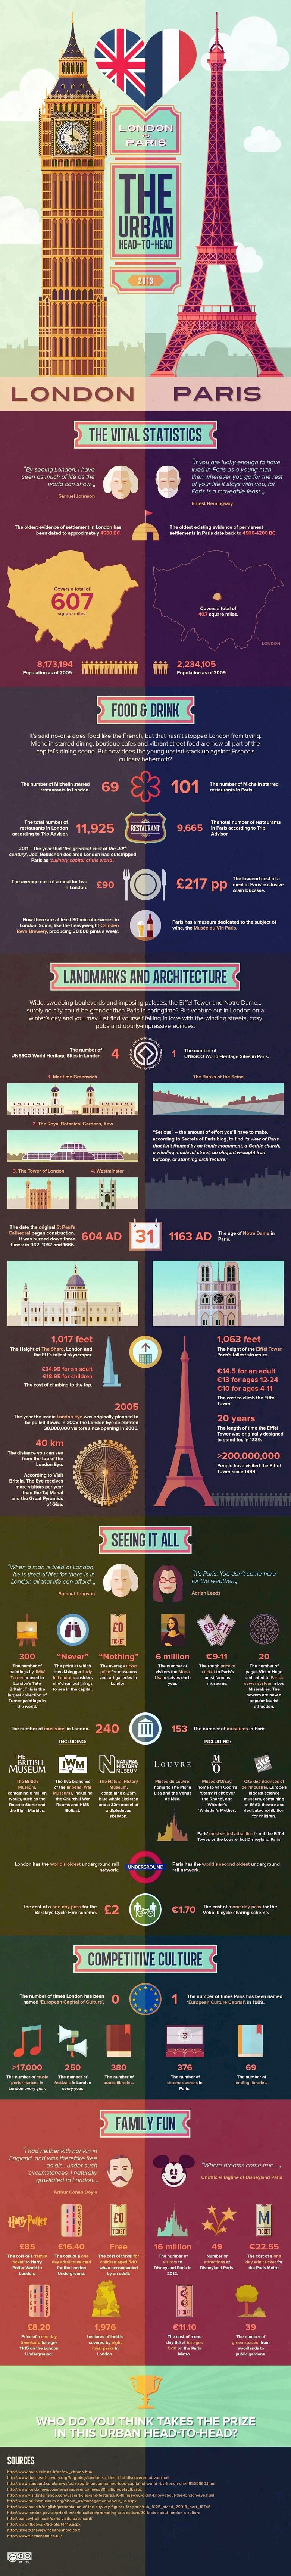 London and Paris, comparison and vital statistics